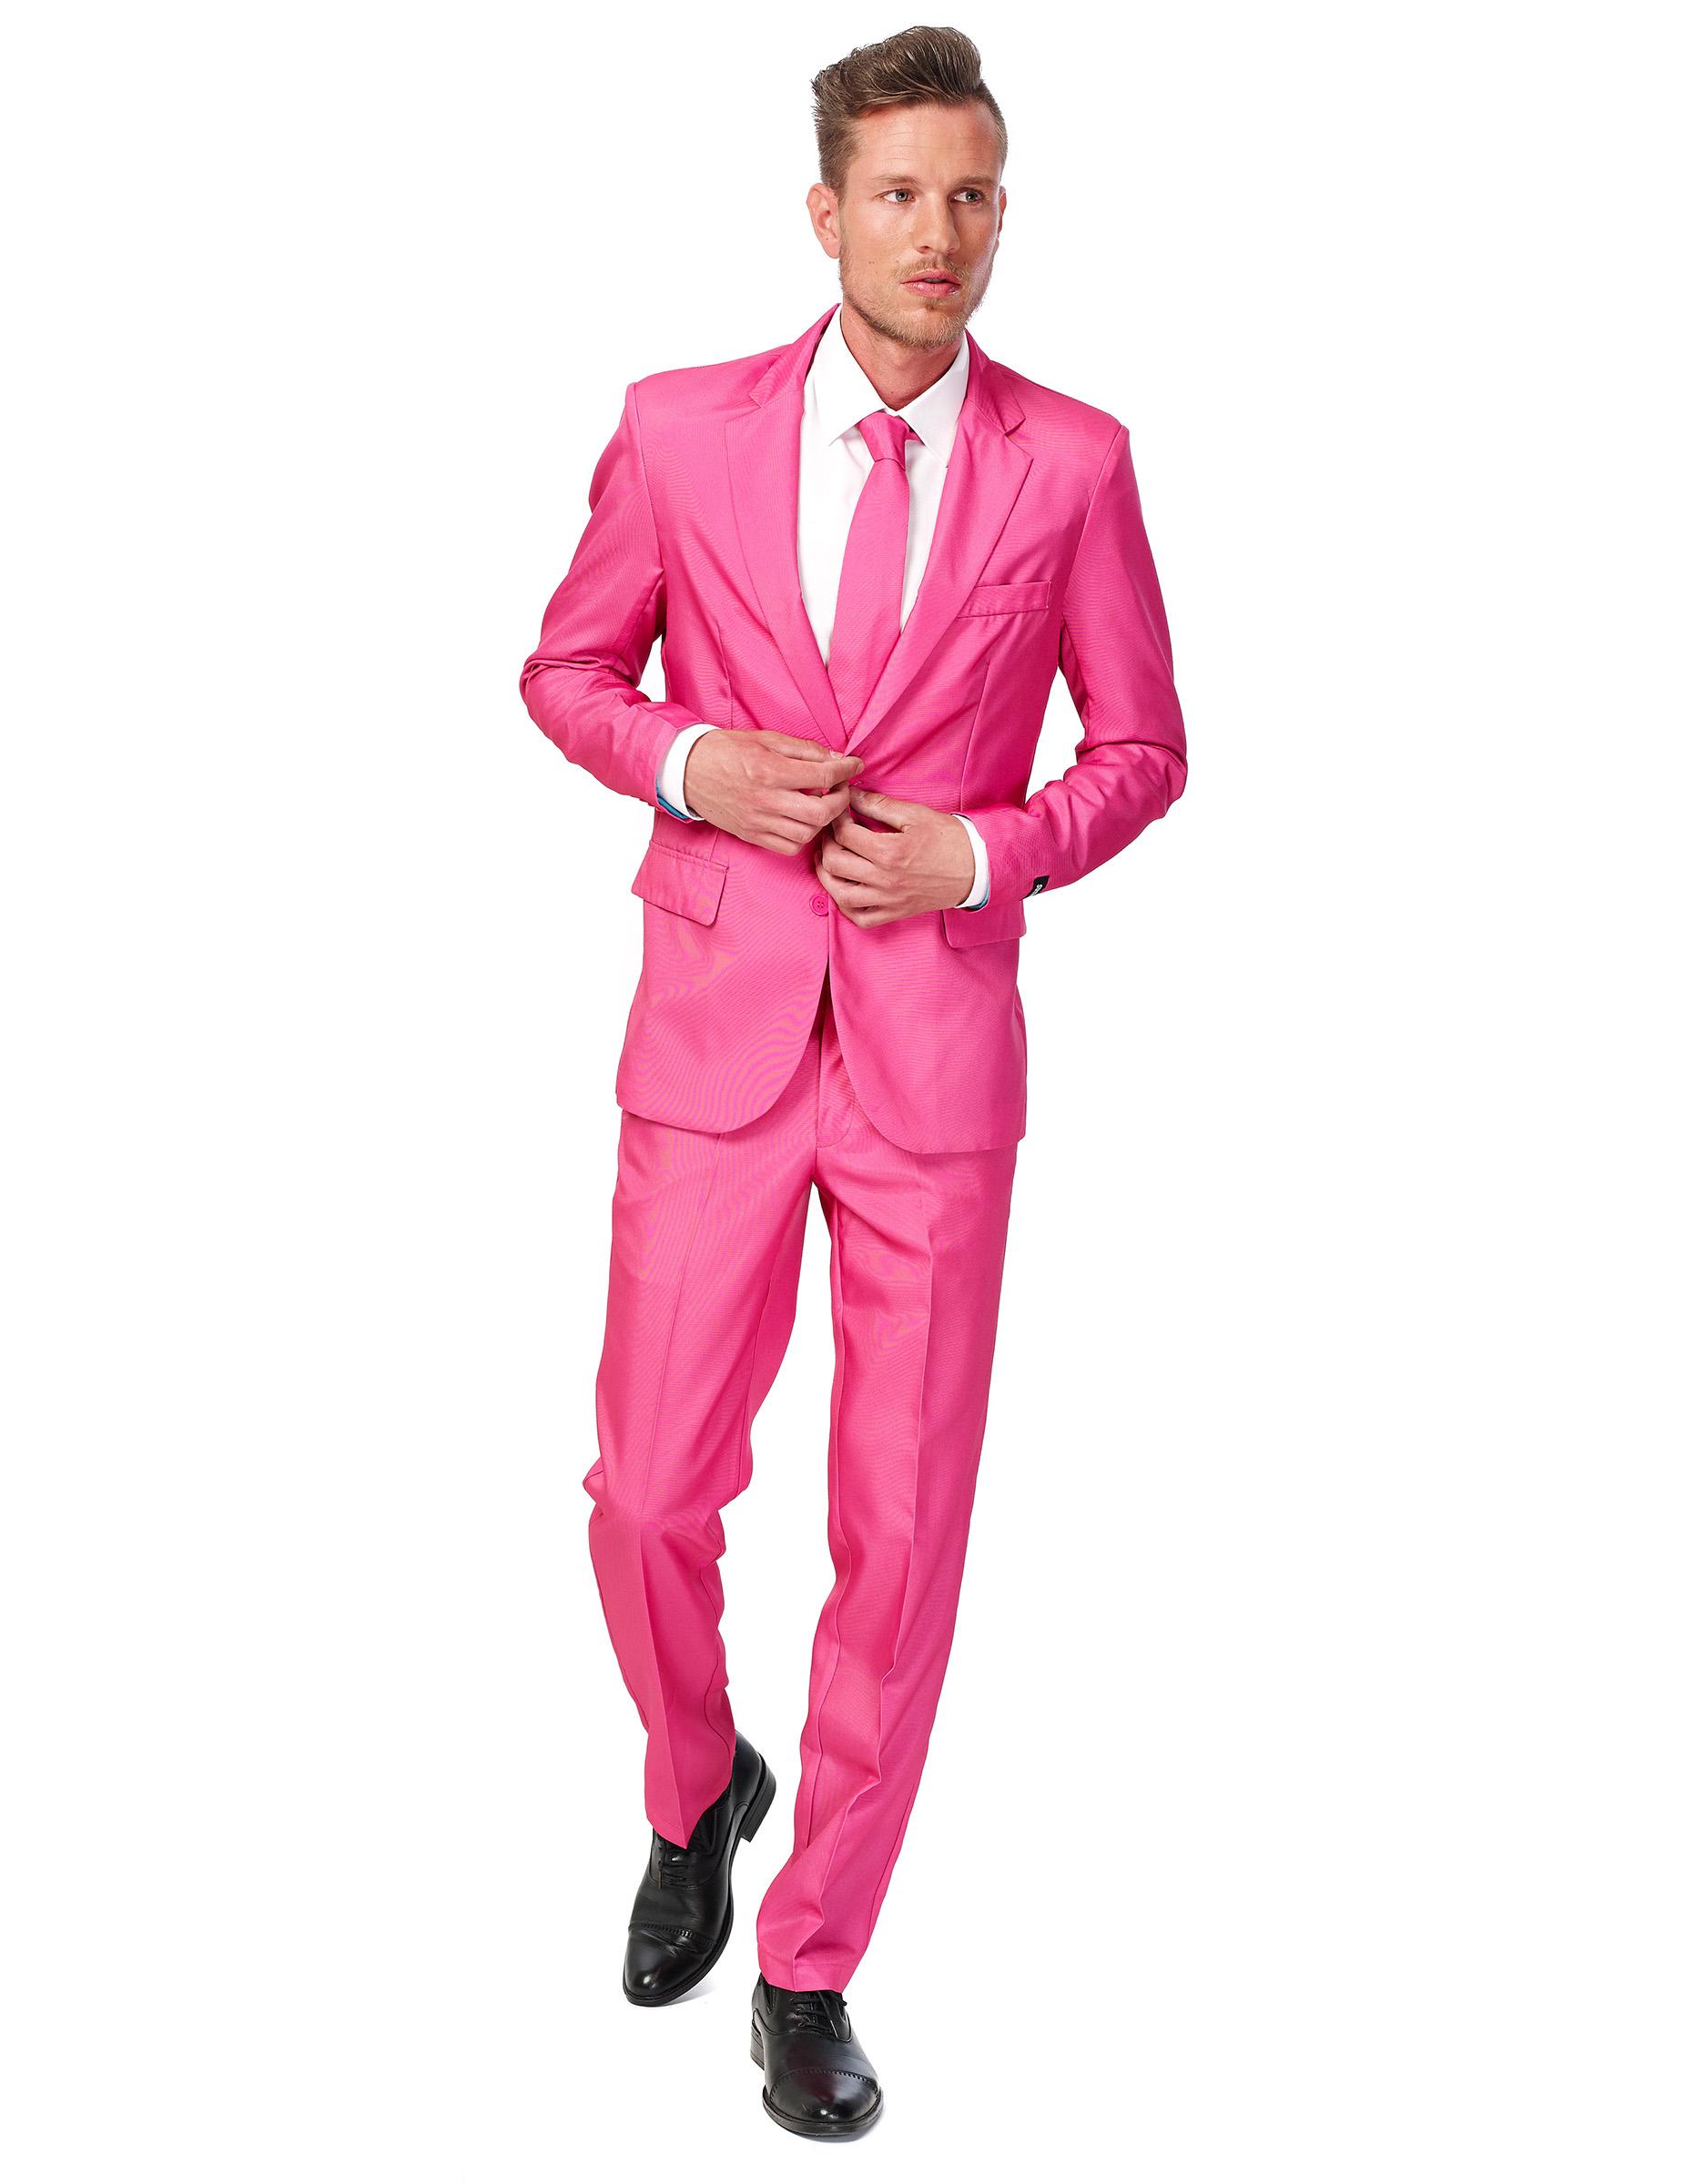 costume rose homme suitmeister d coration anniversaire et f tes th me sur vegaoo party. Black Bedroom Furniture Sets. Home Design Ideas